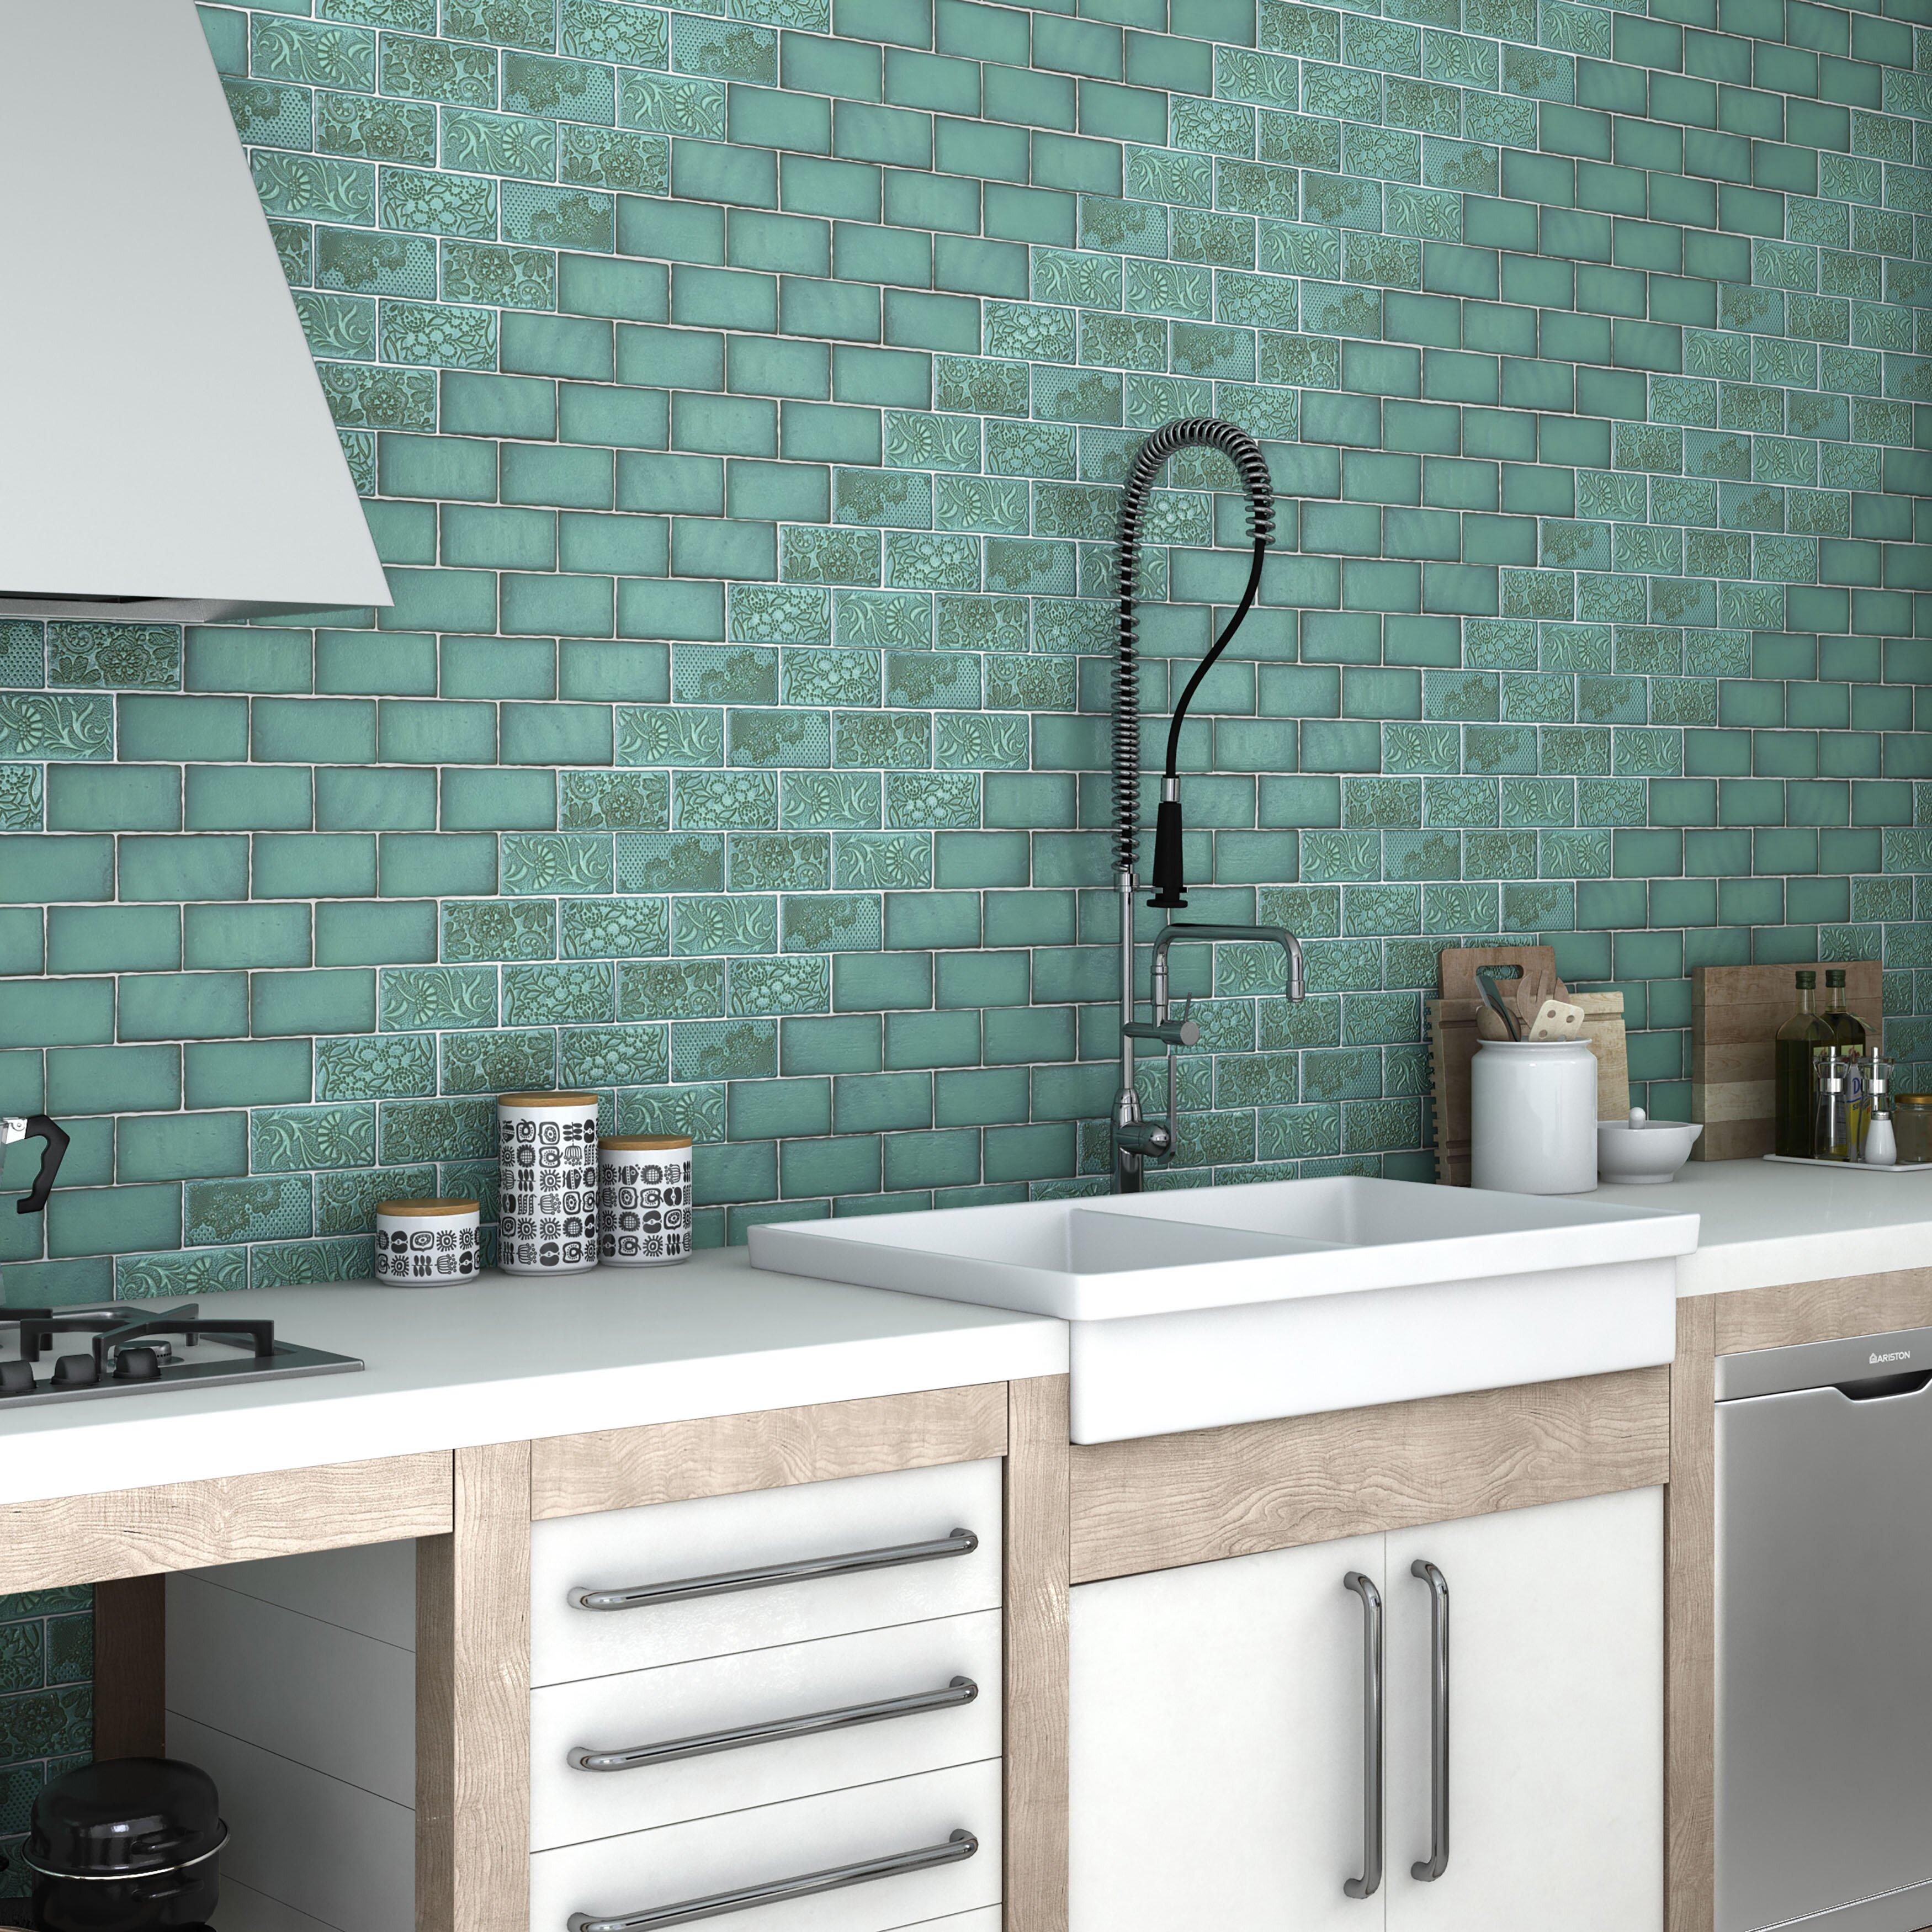 Elitetile antiqua 3 x 6 ceramic subway tile in feelings lava verde reviews wayfair - Fliesen scheld ...